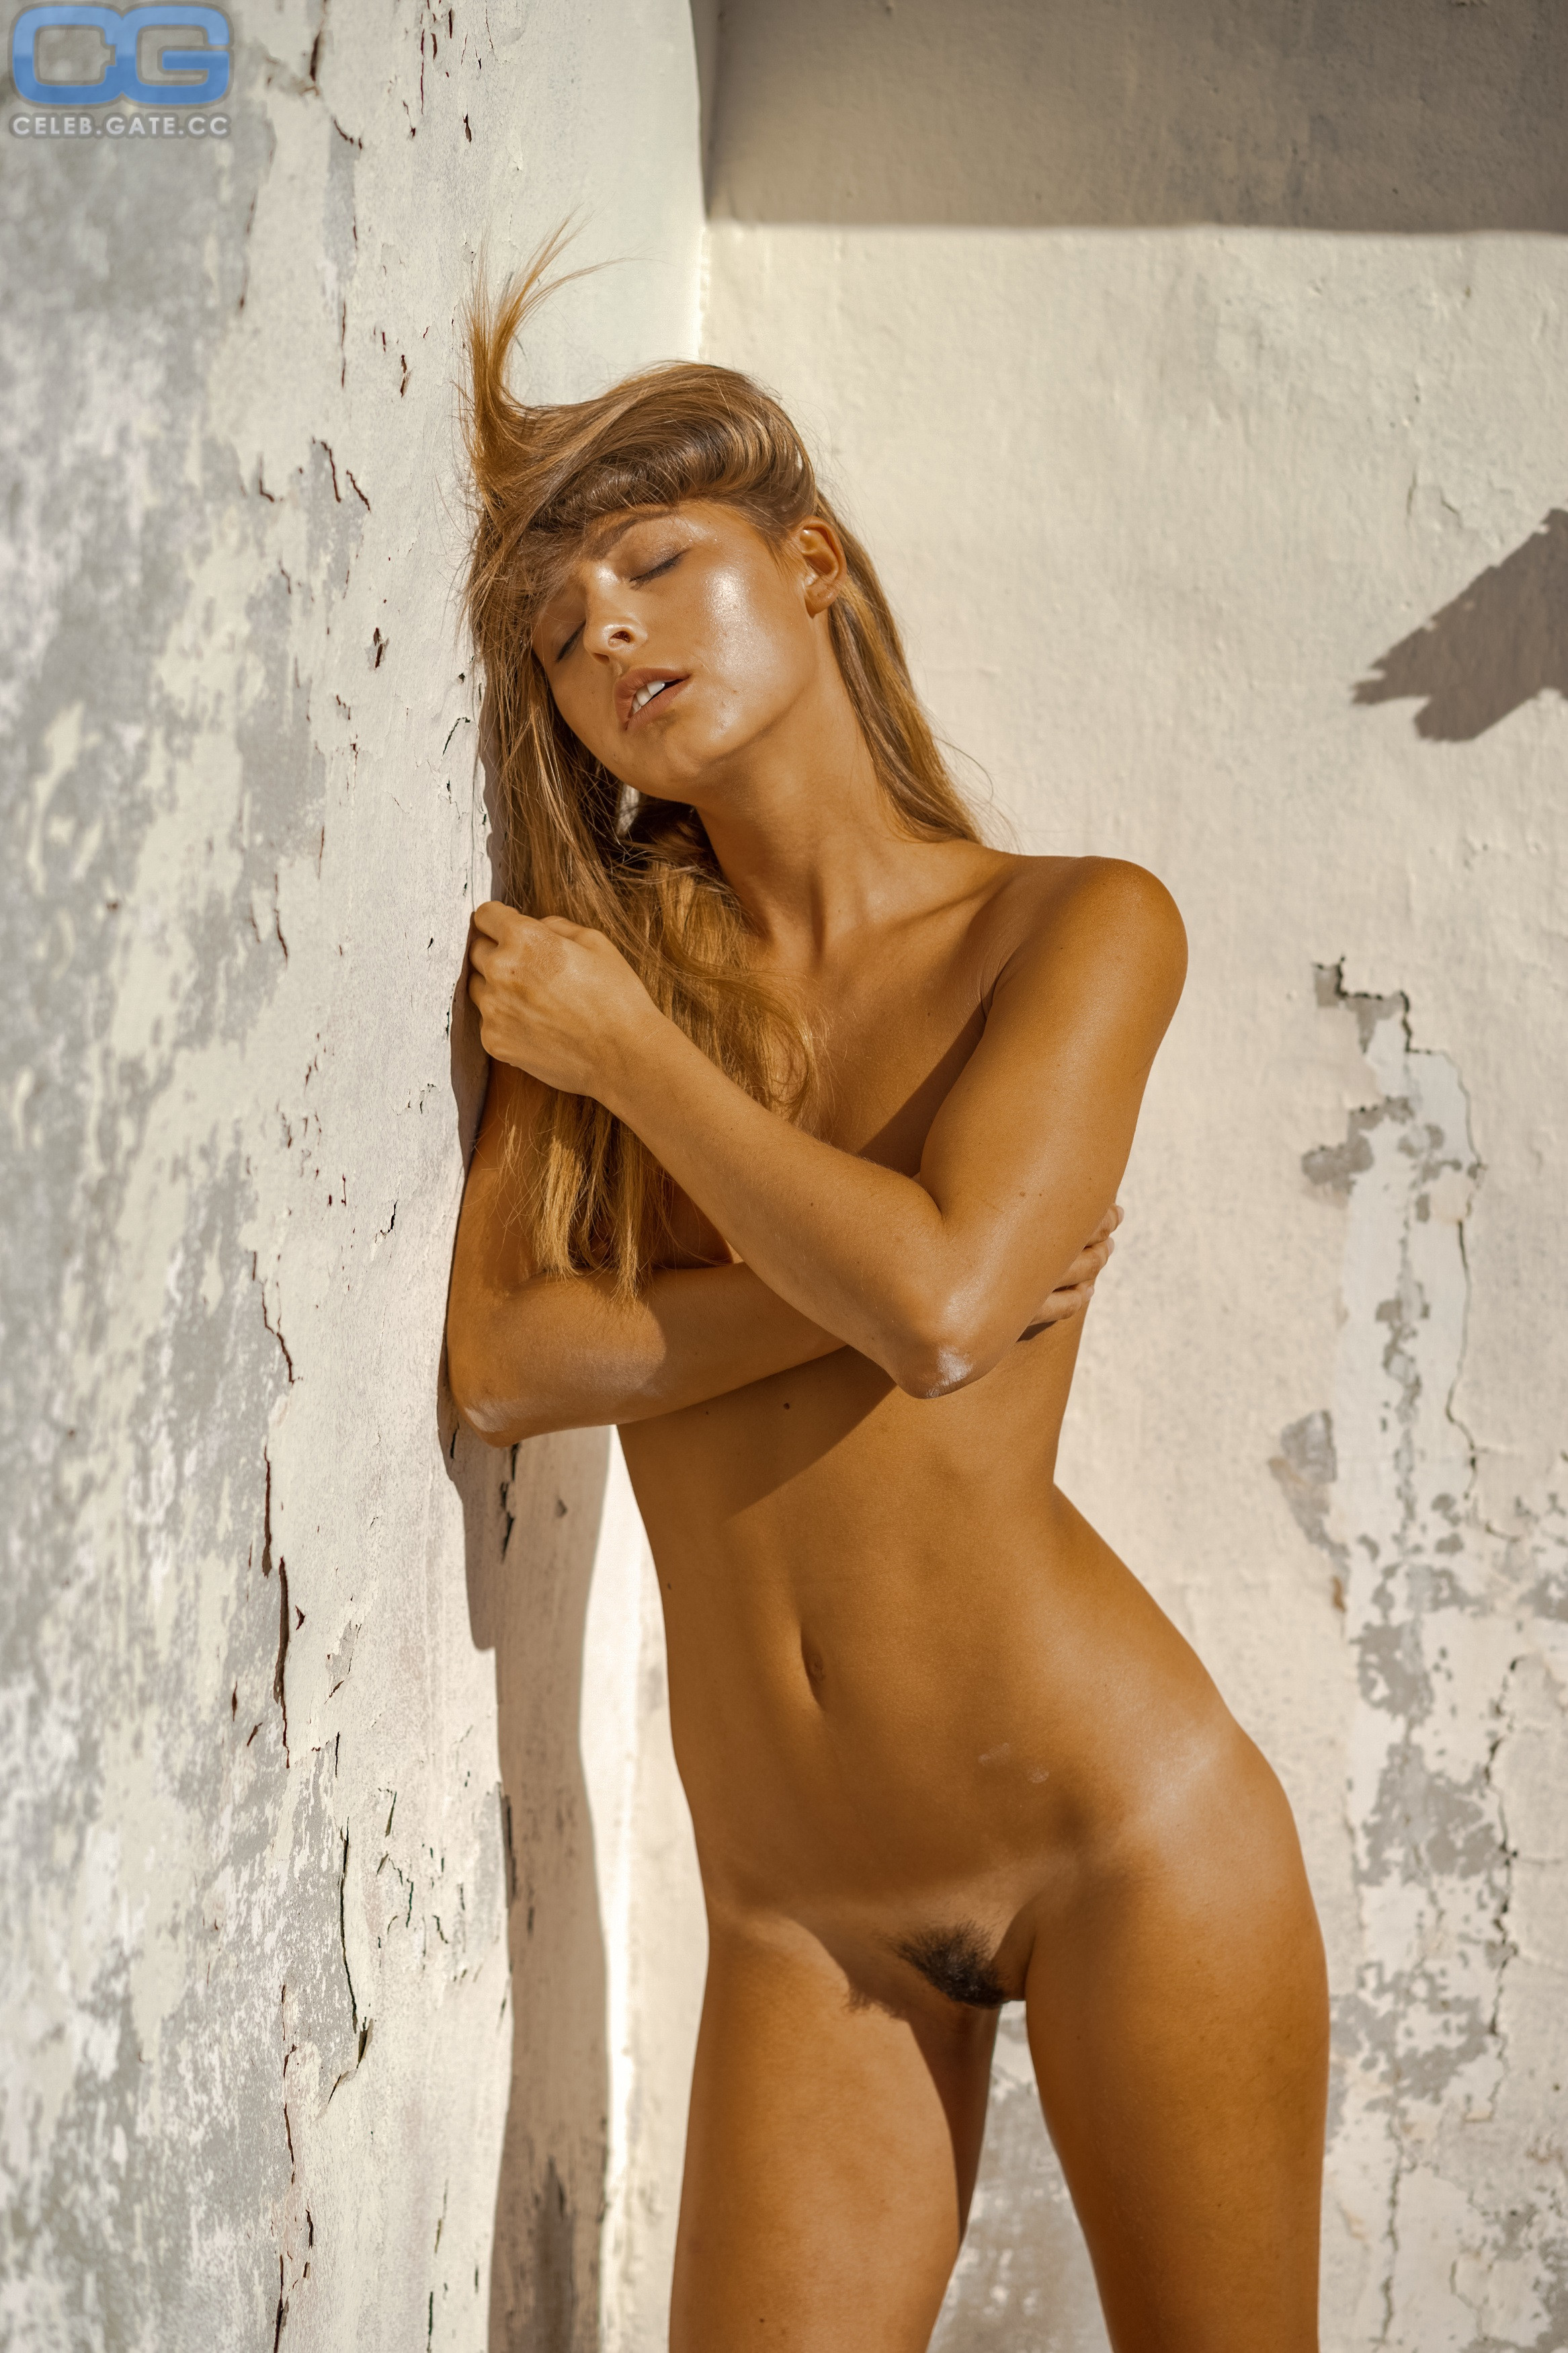 Papen nude marisa Marisa Papen